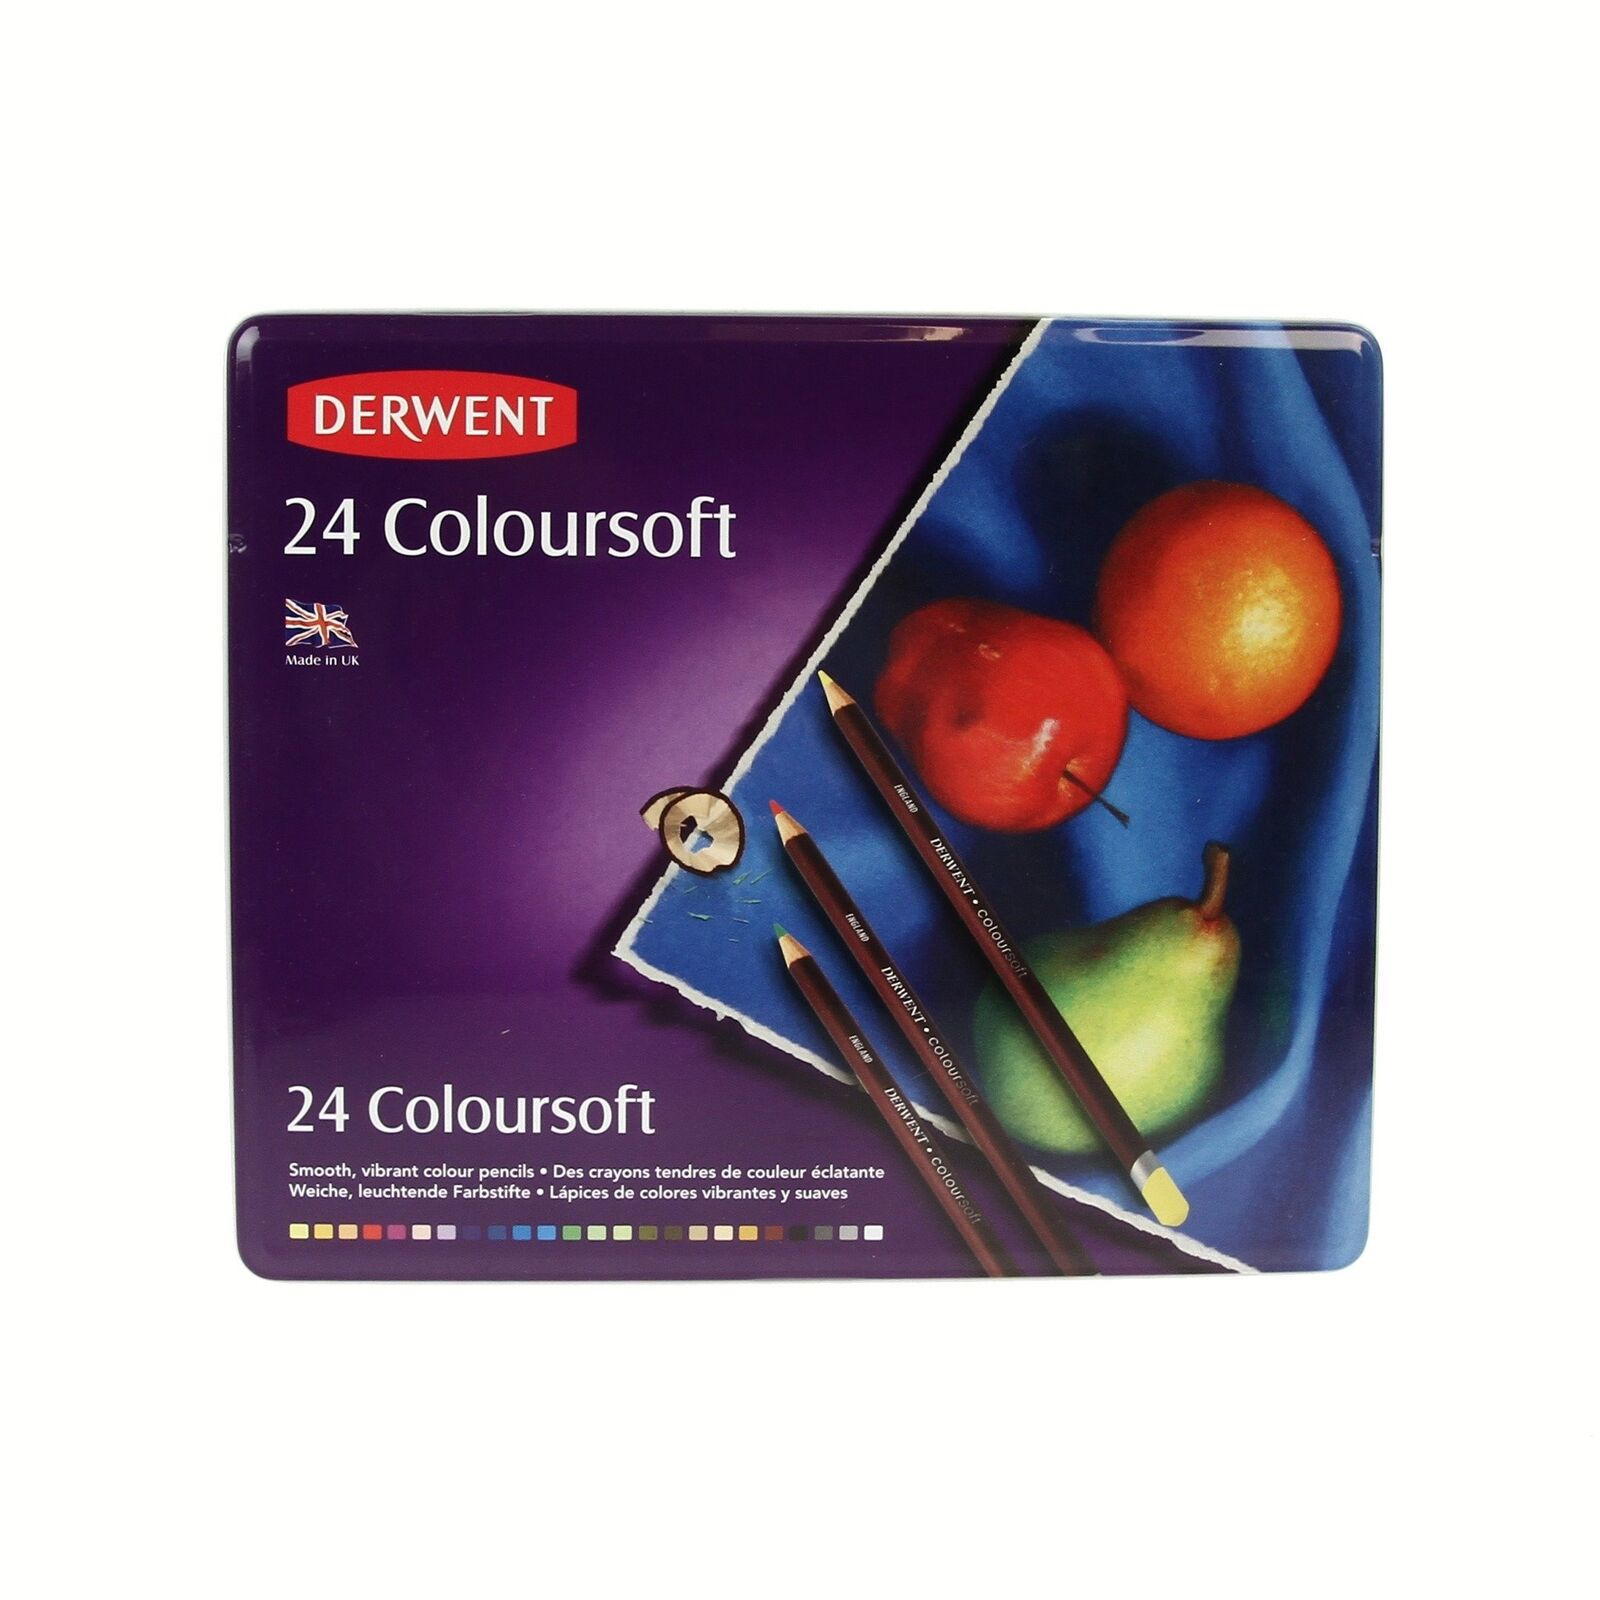 Derwent Coloursoft Lápices 24 Tin